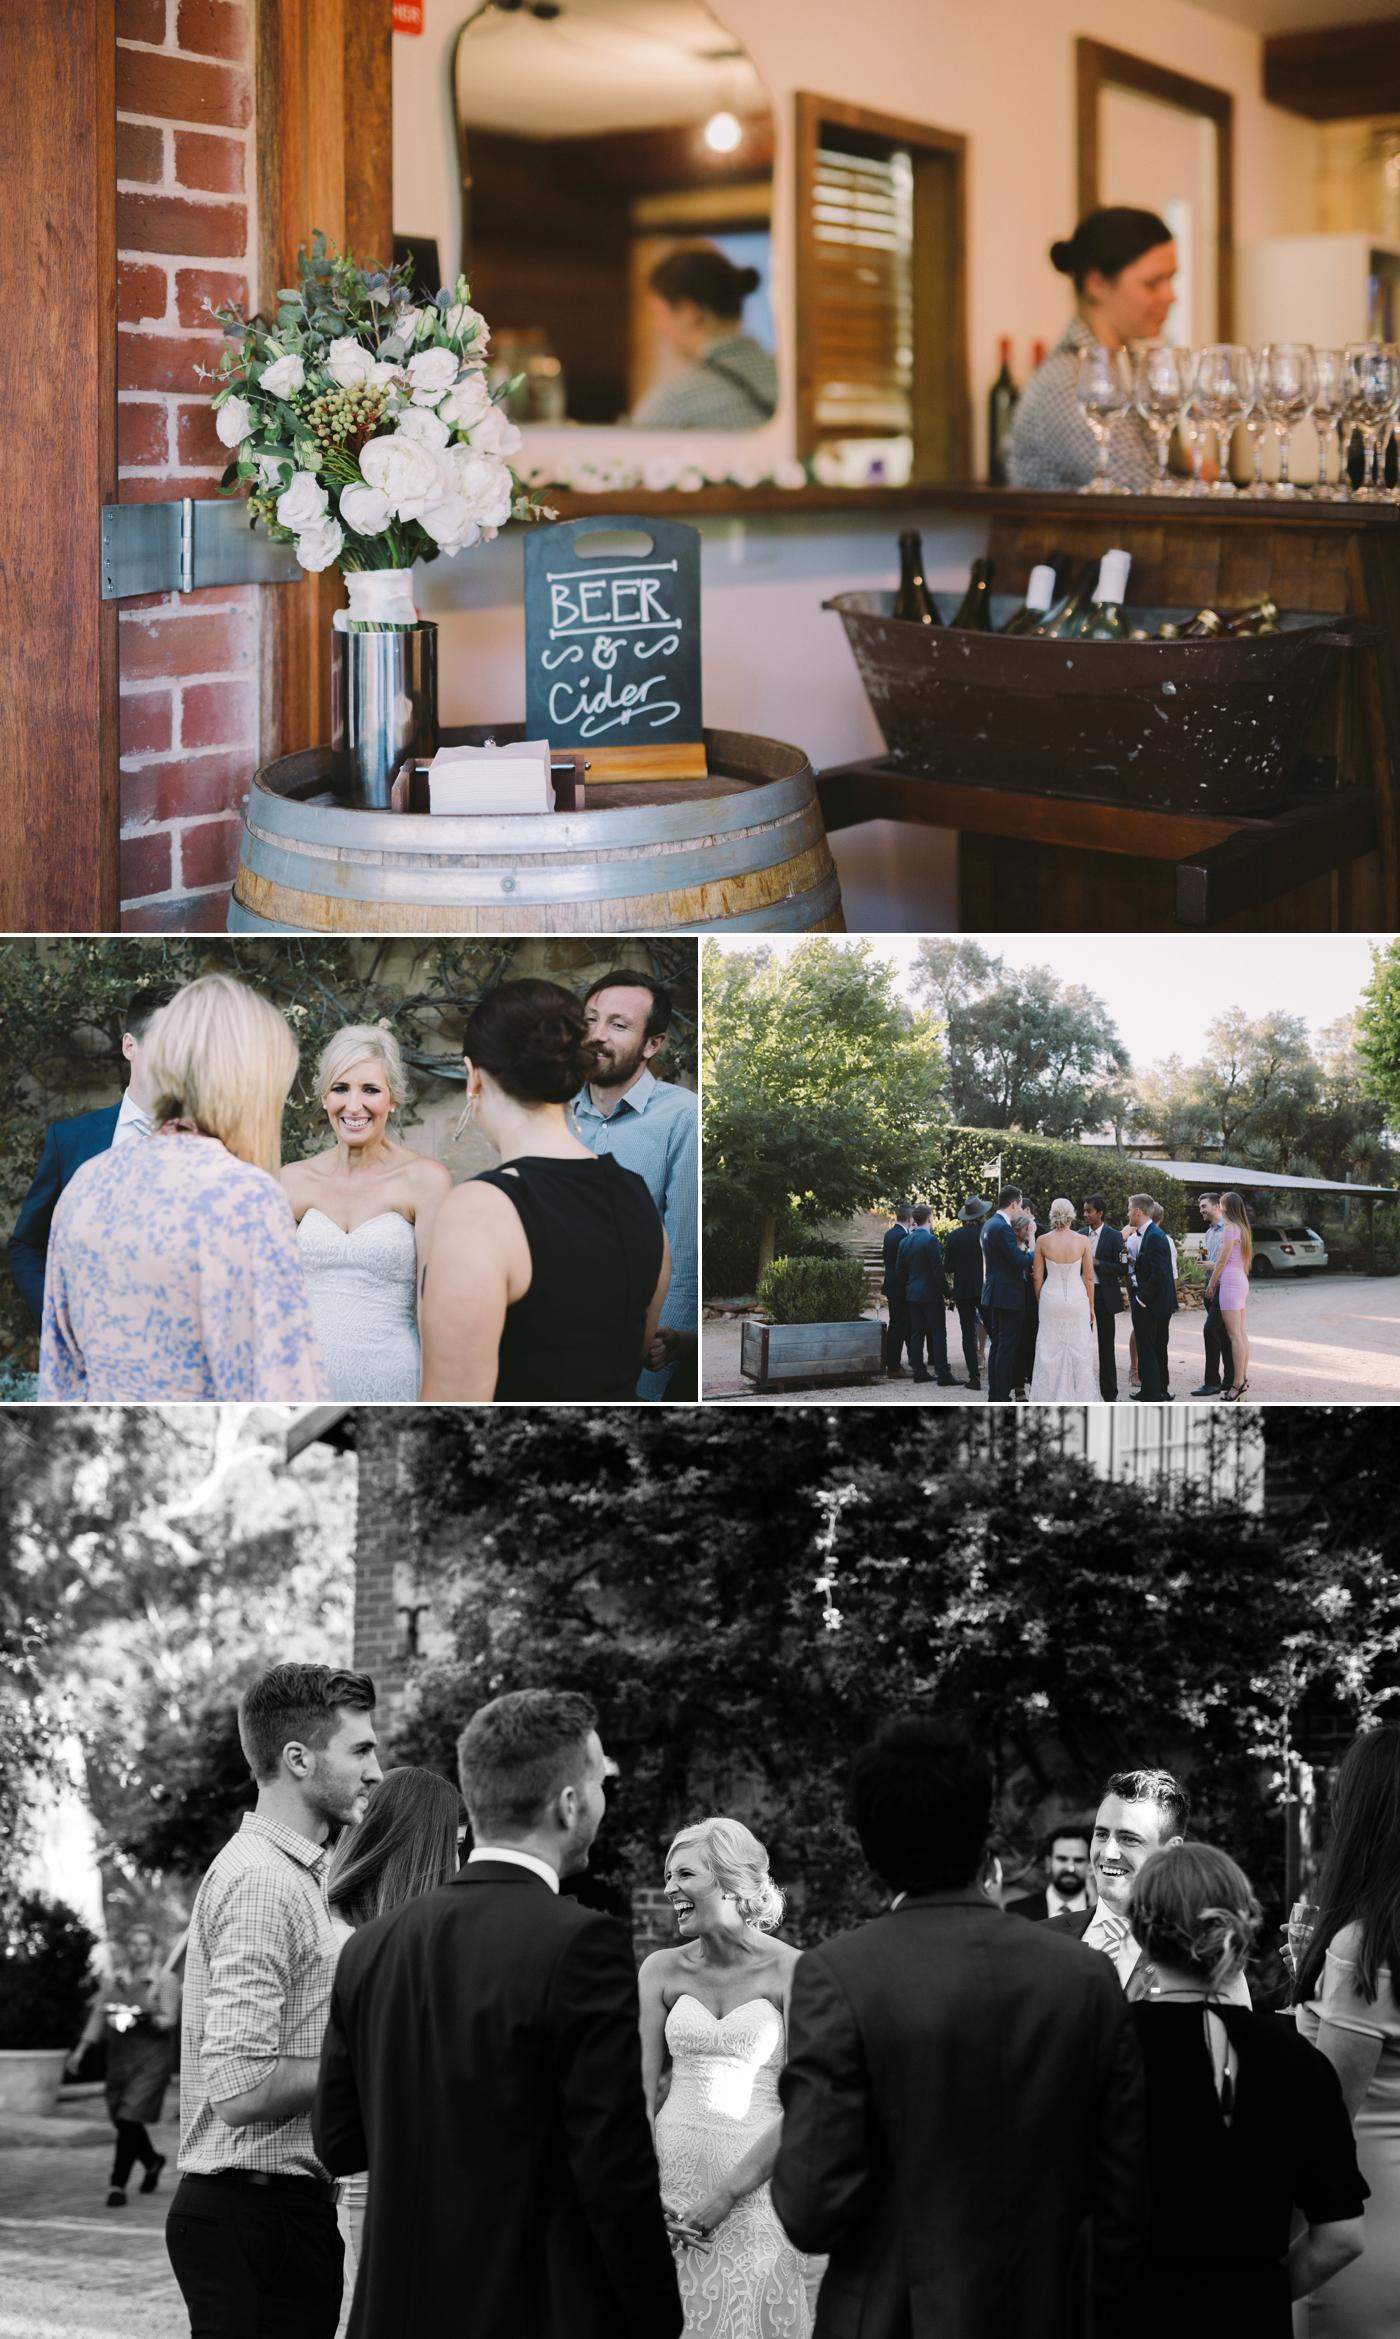 Lauren & Max - Marybank Estate Wedding - Natural wedding photographer in Adelaide - www.katherineschultzphotography.com 94